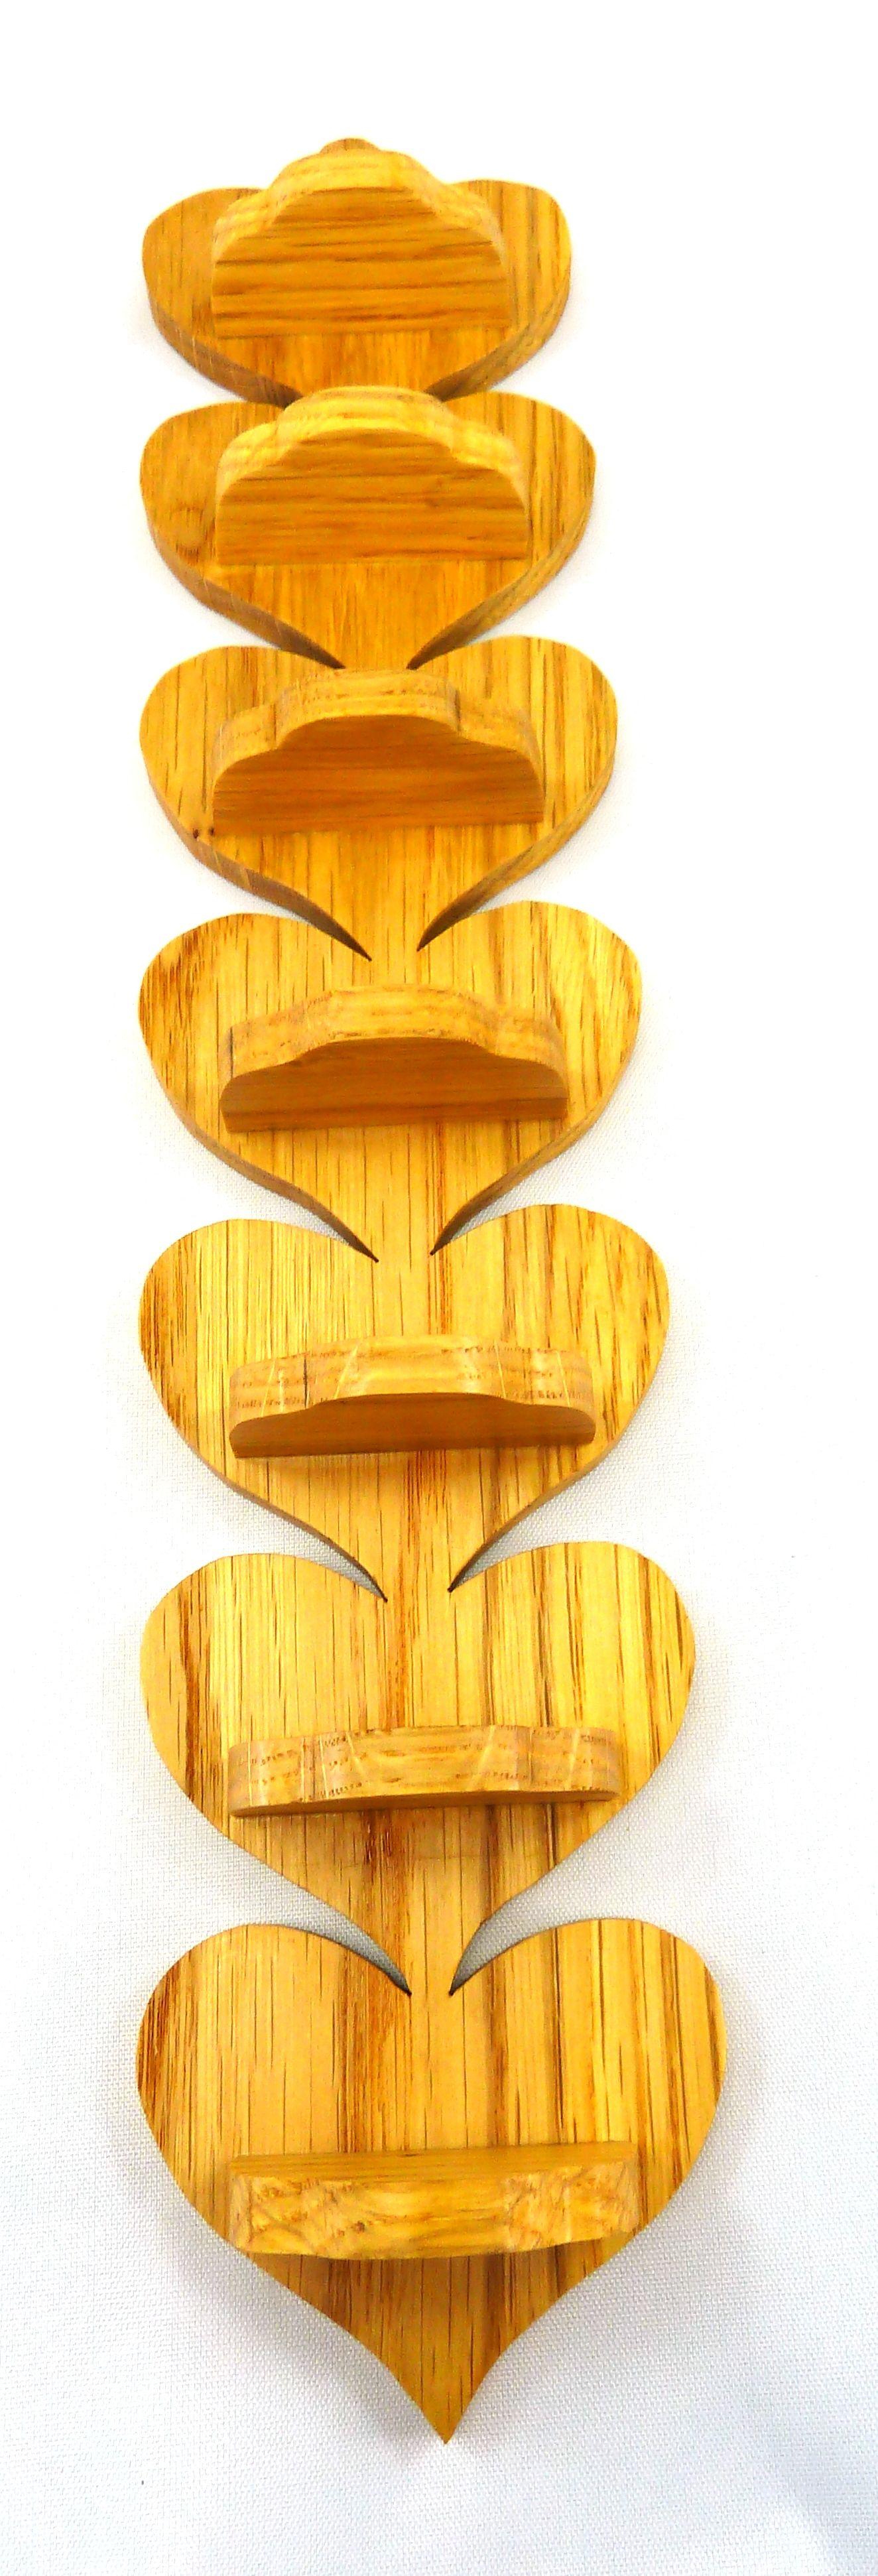 Rustic Wood Shelf, Wall Shelf, Wood Wall Art, Heart, Farm, Country ...